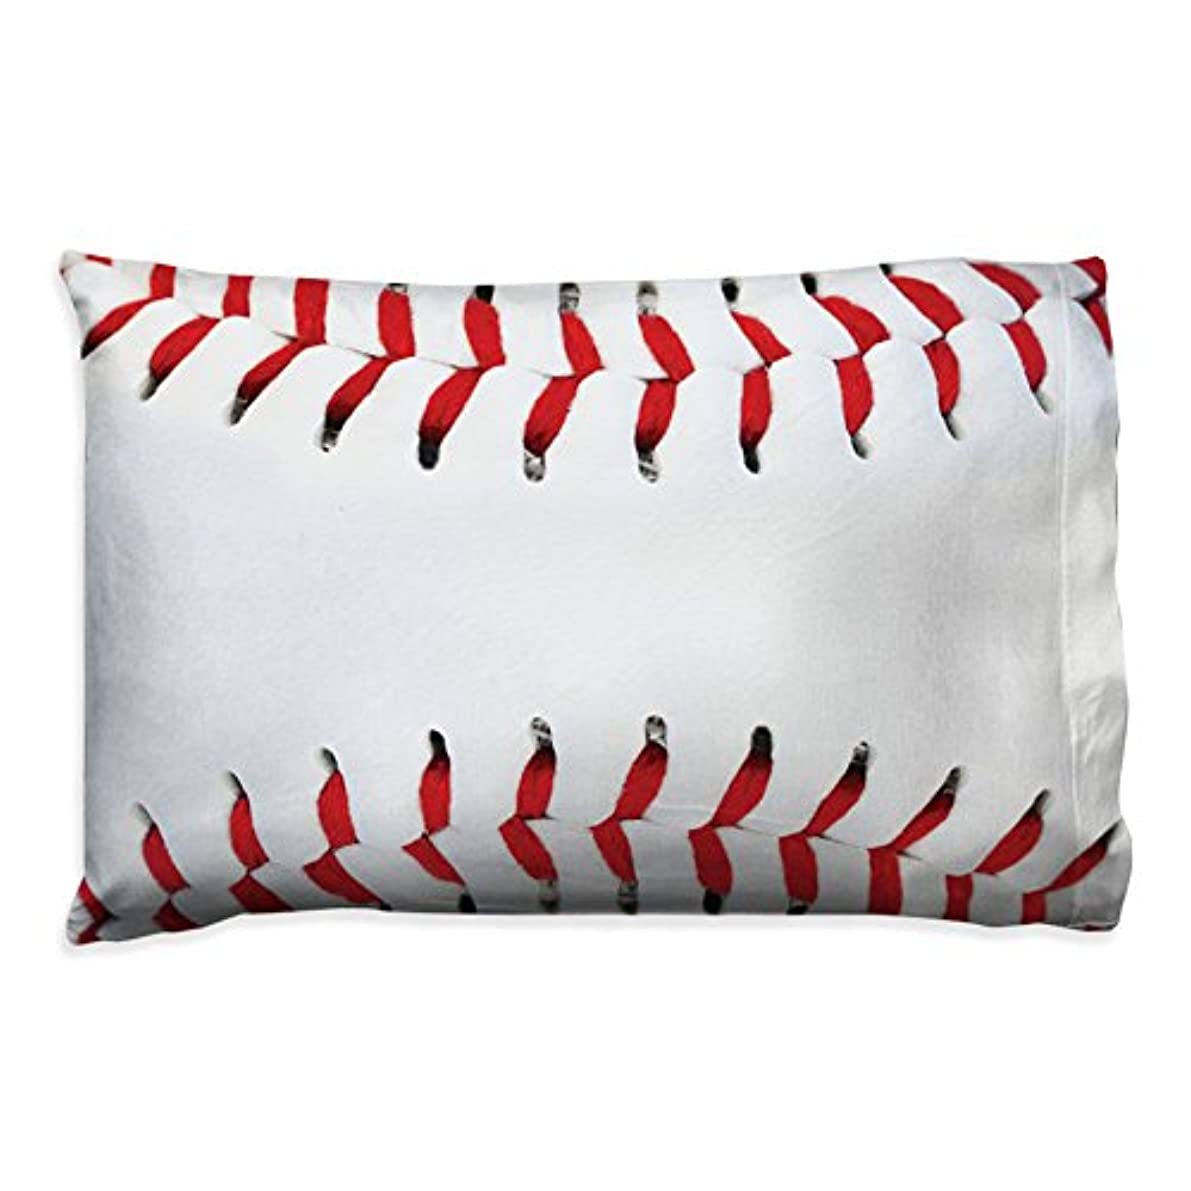 Graphic Pillowcase   Baseball Pillows by ChalkTalk Sports